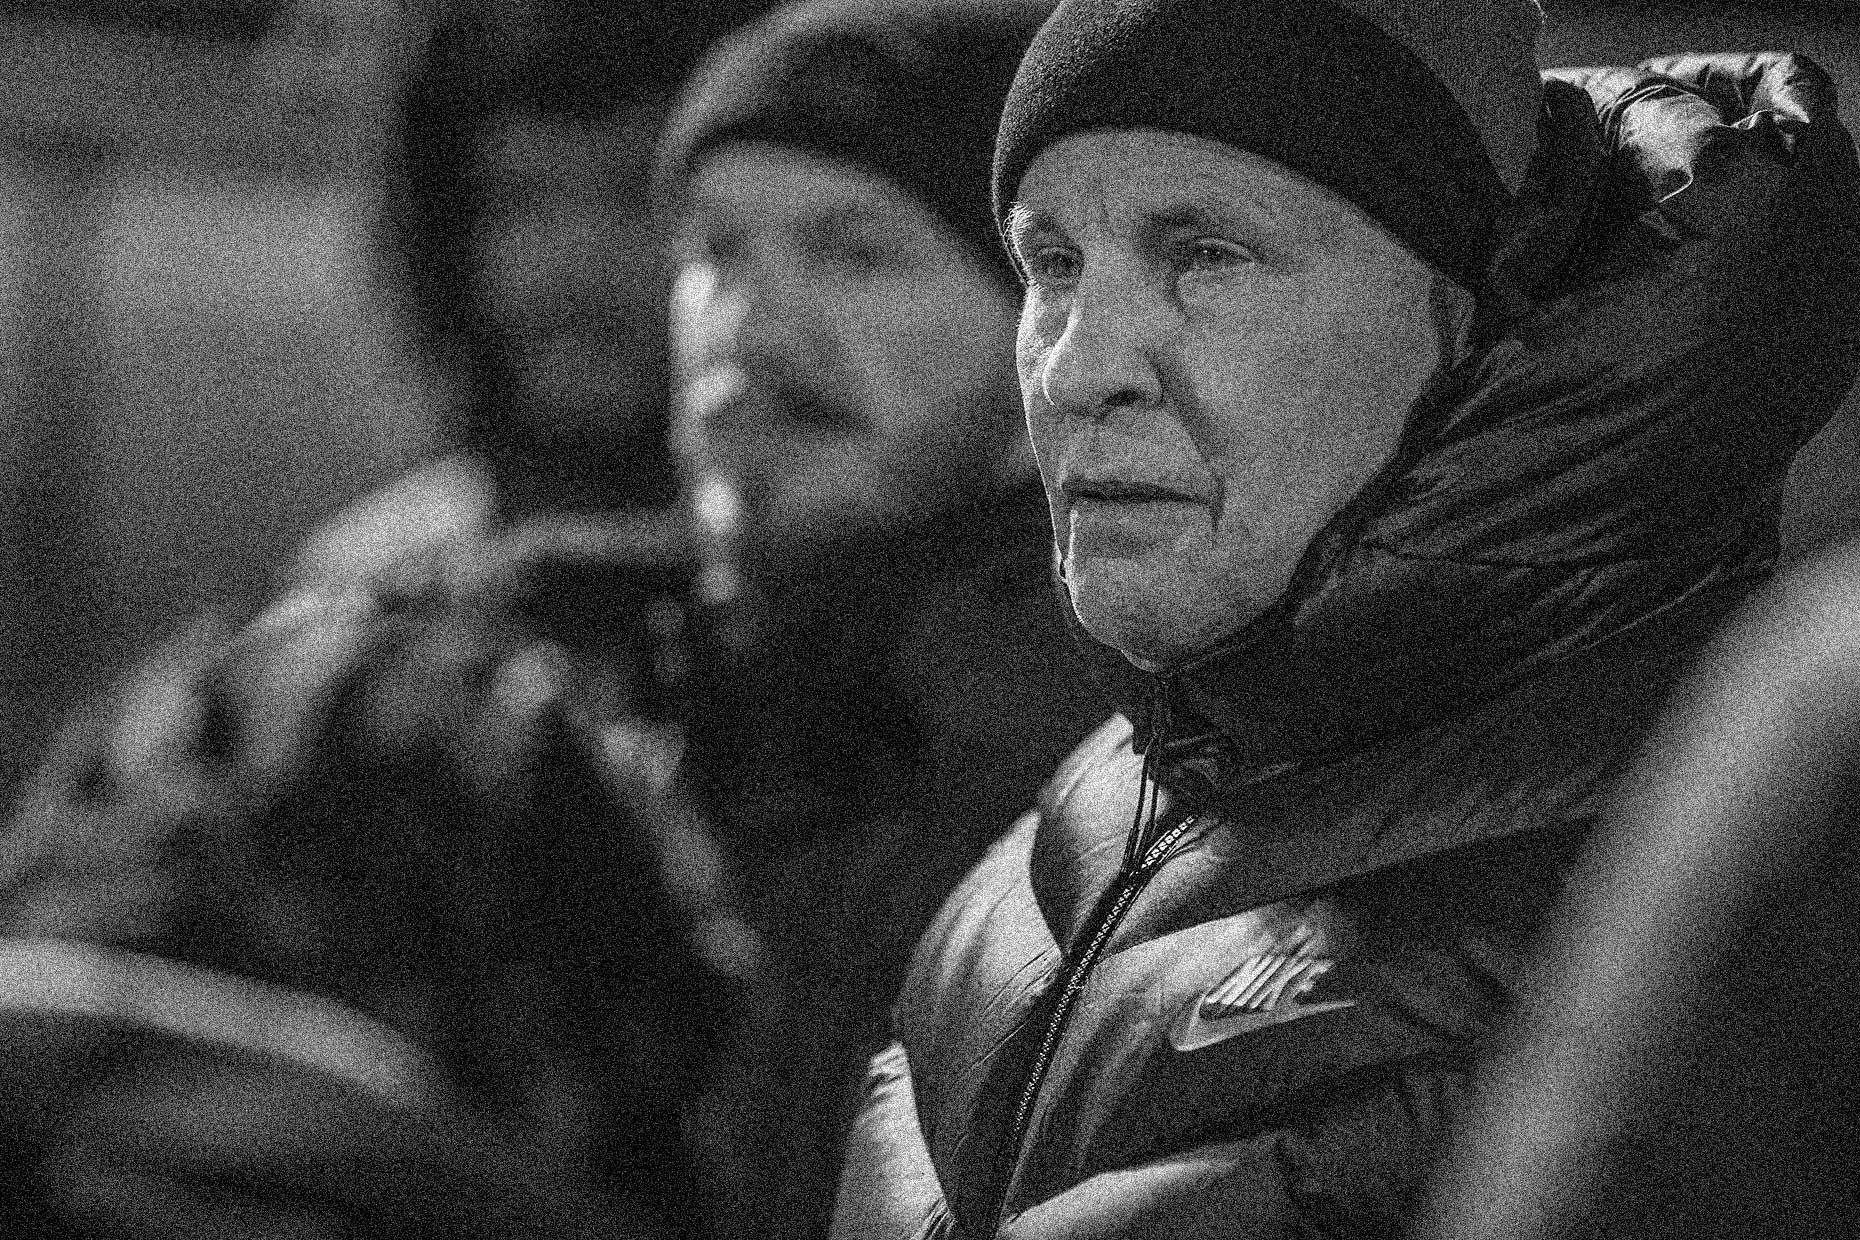 City spotlight on New York: <br> conversation with Coach Jake